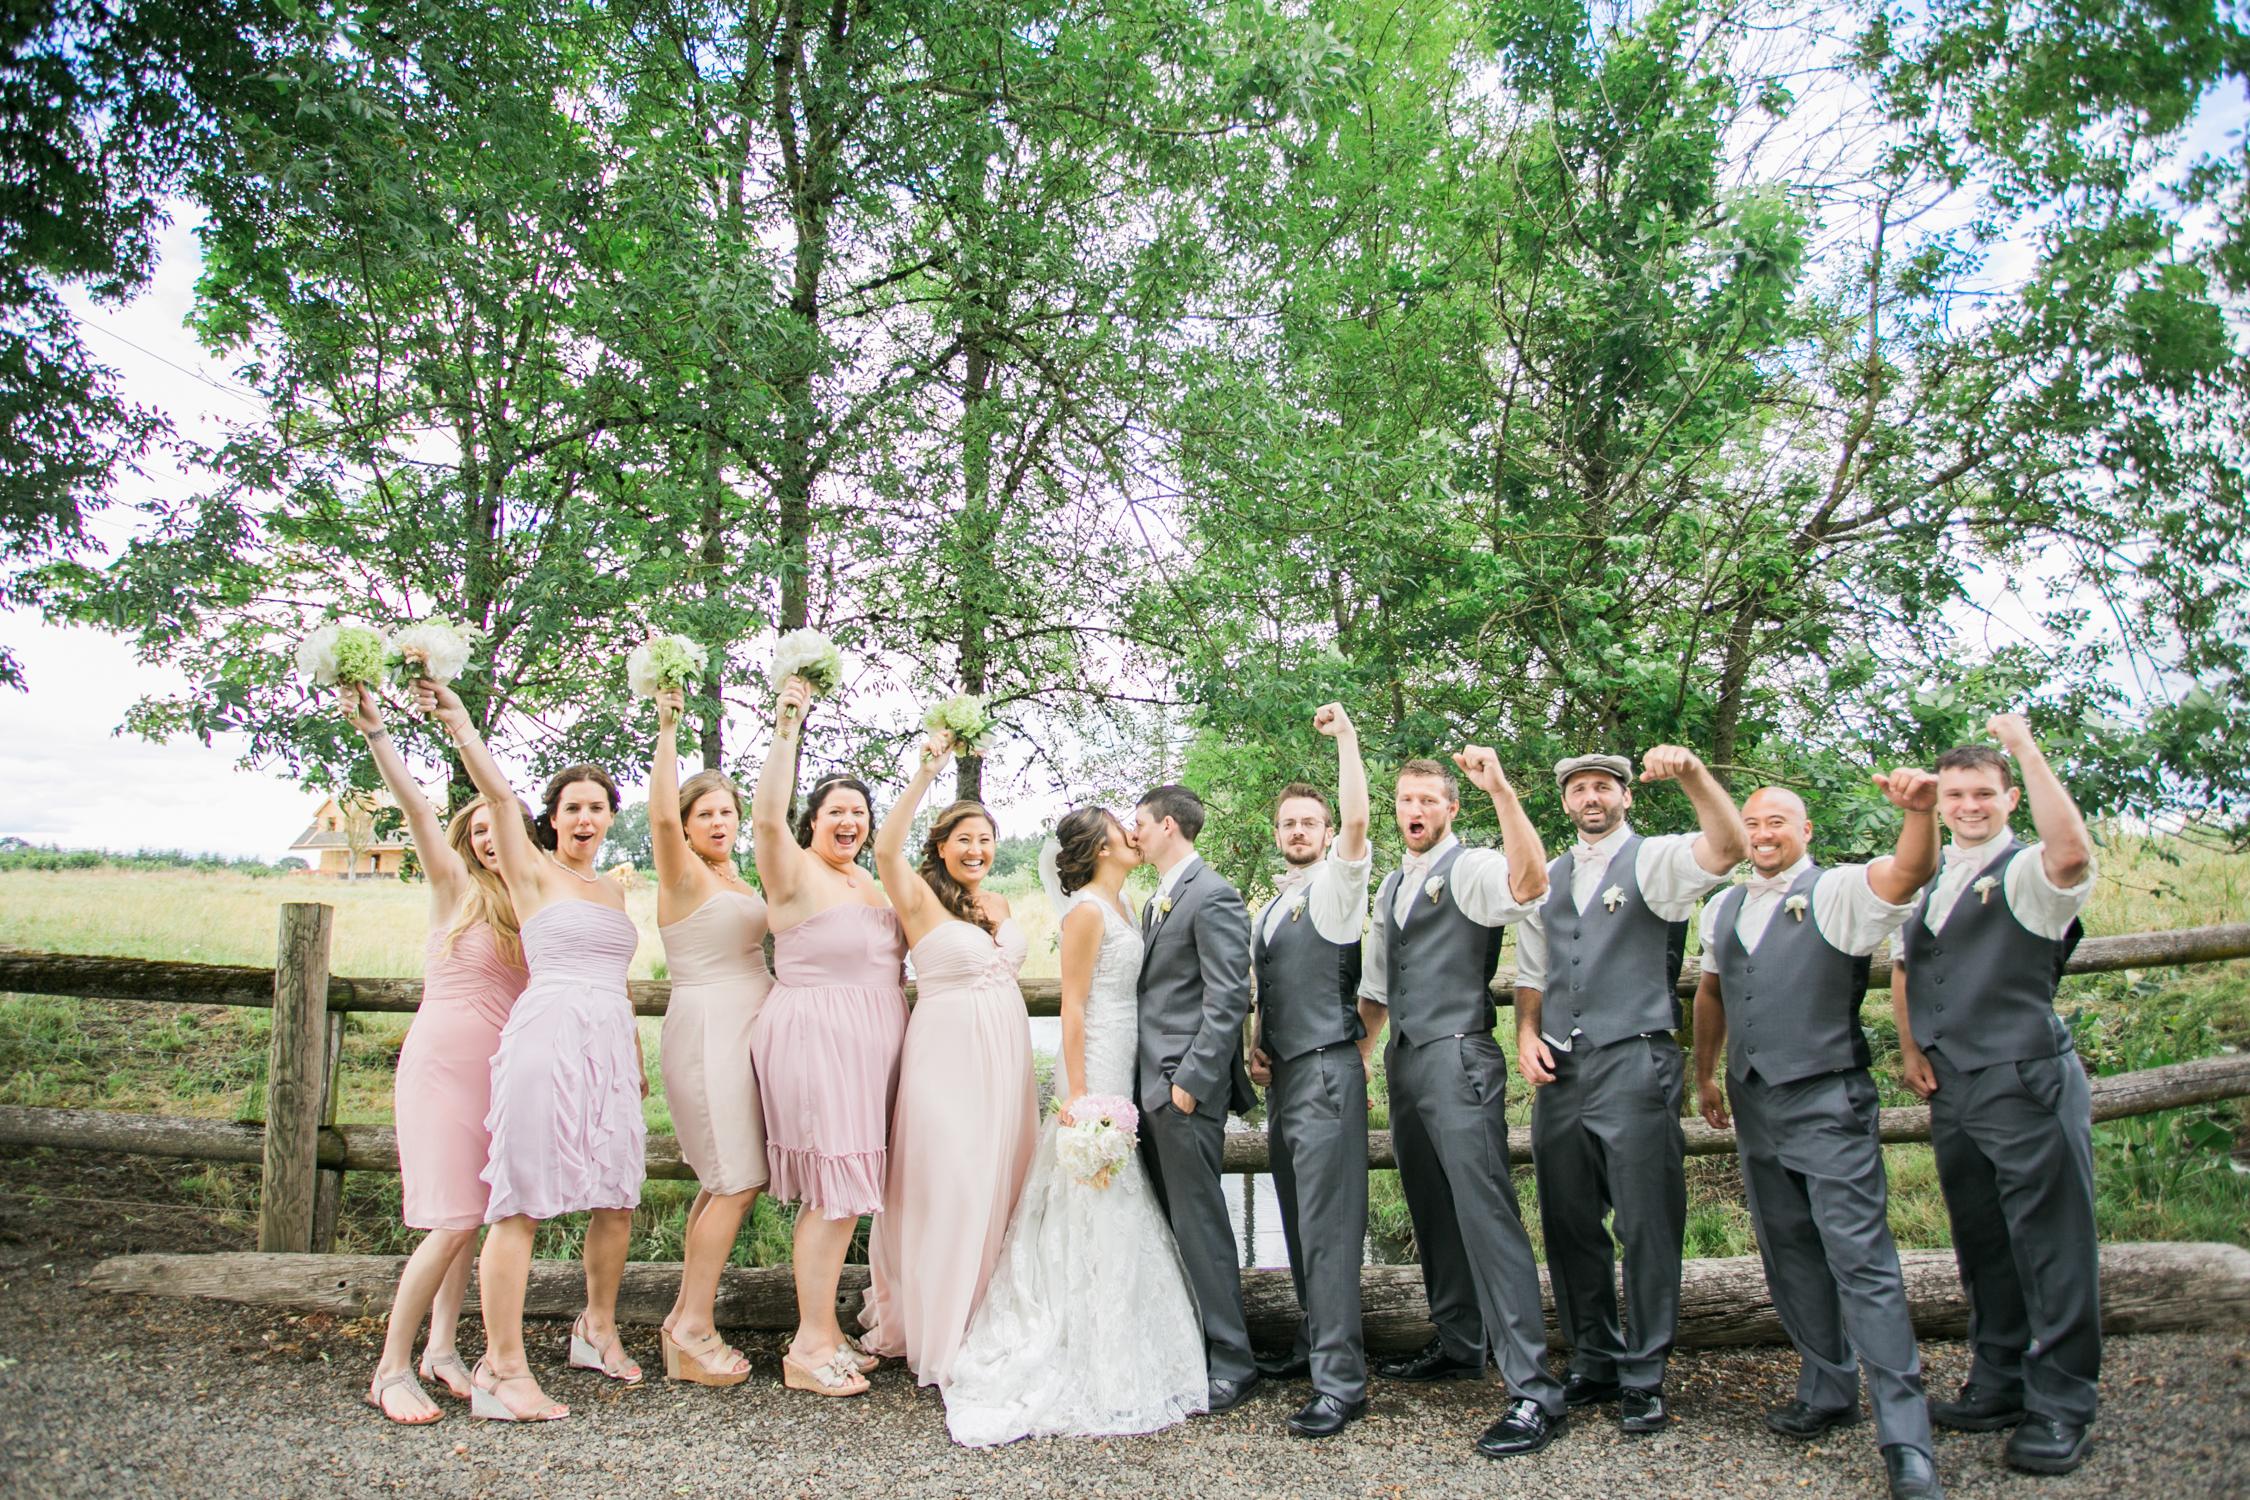 Postlewaits Oregon Wedding by Michelle Cross-34.jpg